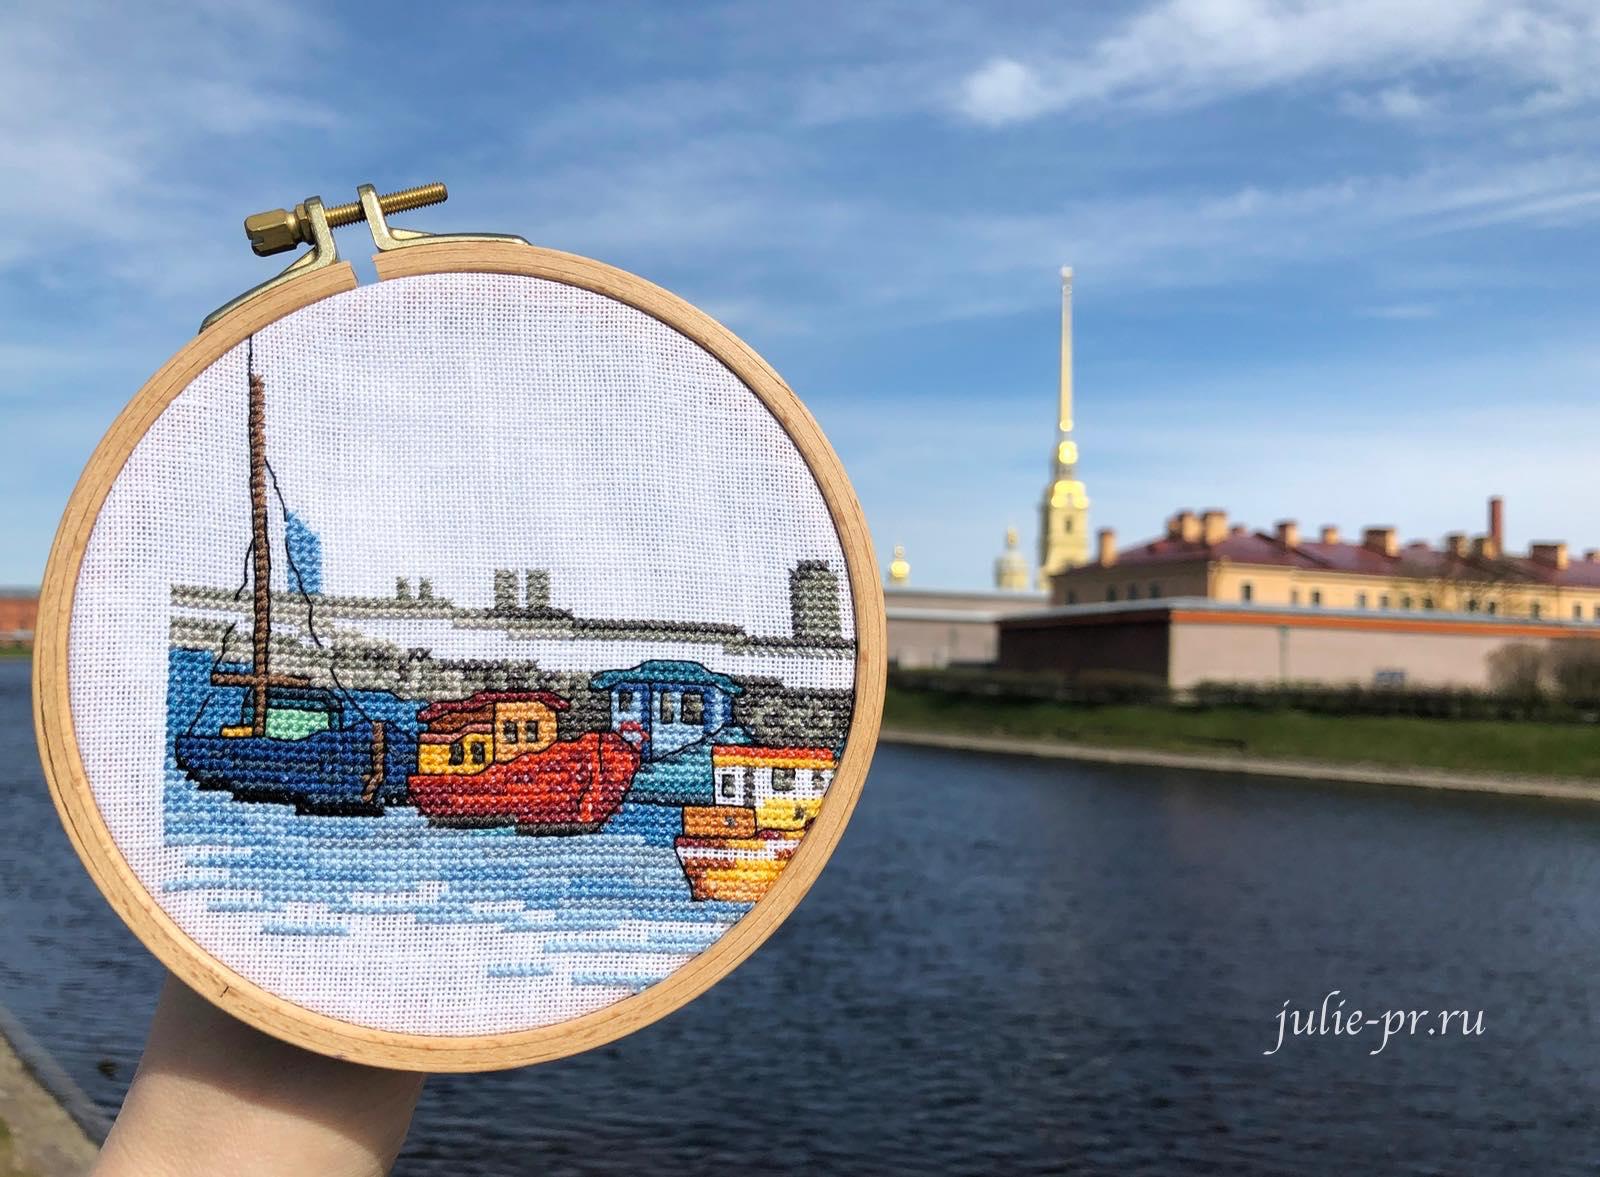 Permin 92-1169 Boats, лодки, Корабли, Берген, вышивка крестом, город, Норвегия